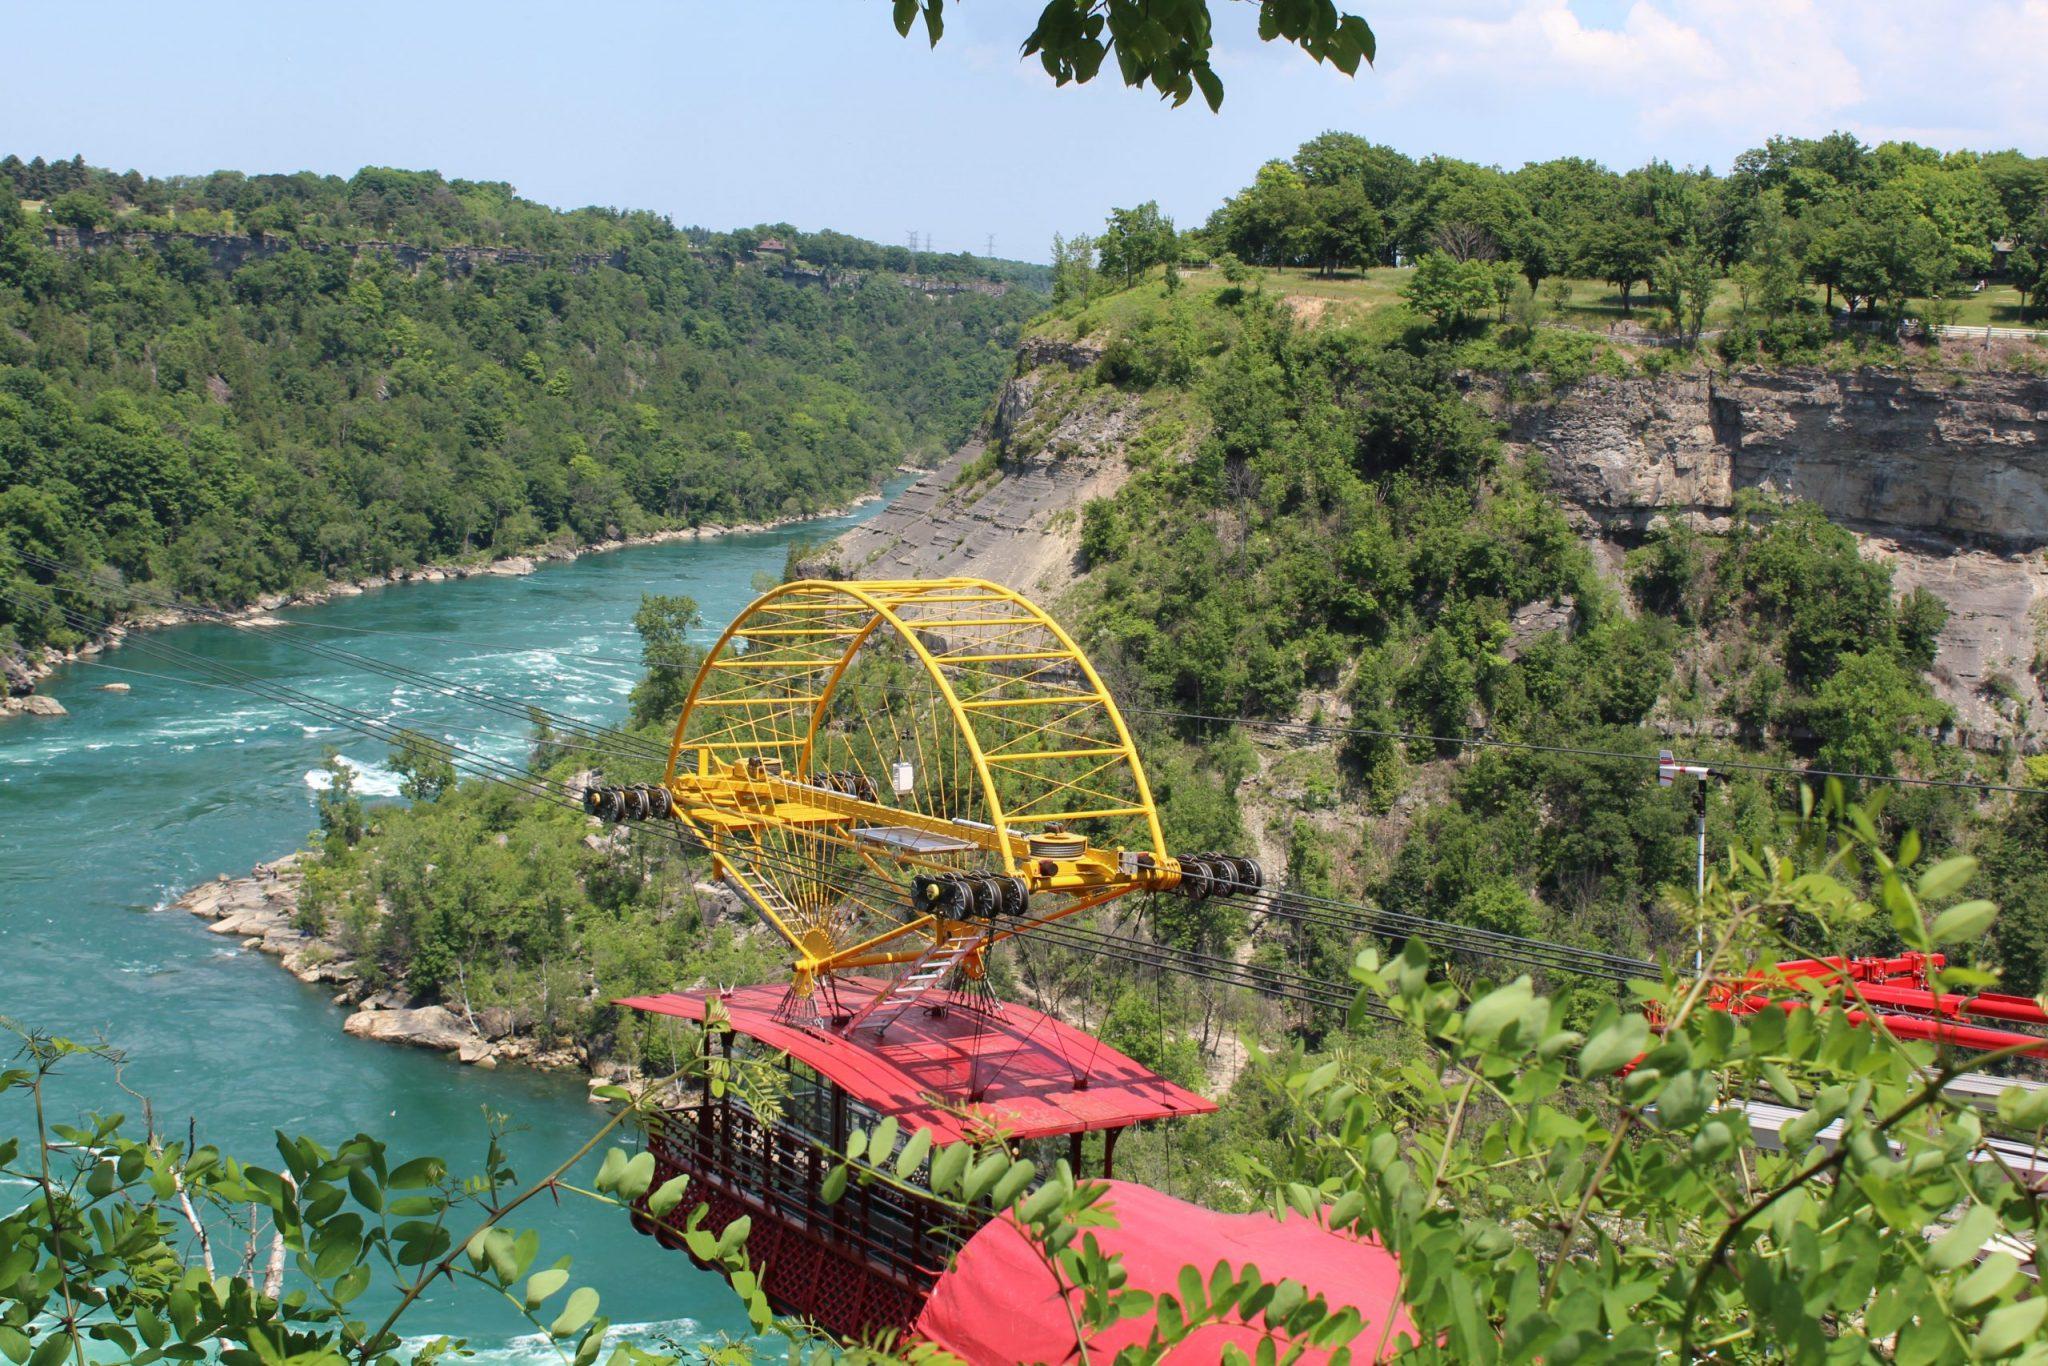 A photo of the whirlpool aerocar above the Niagara River.